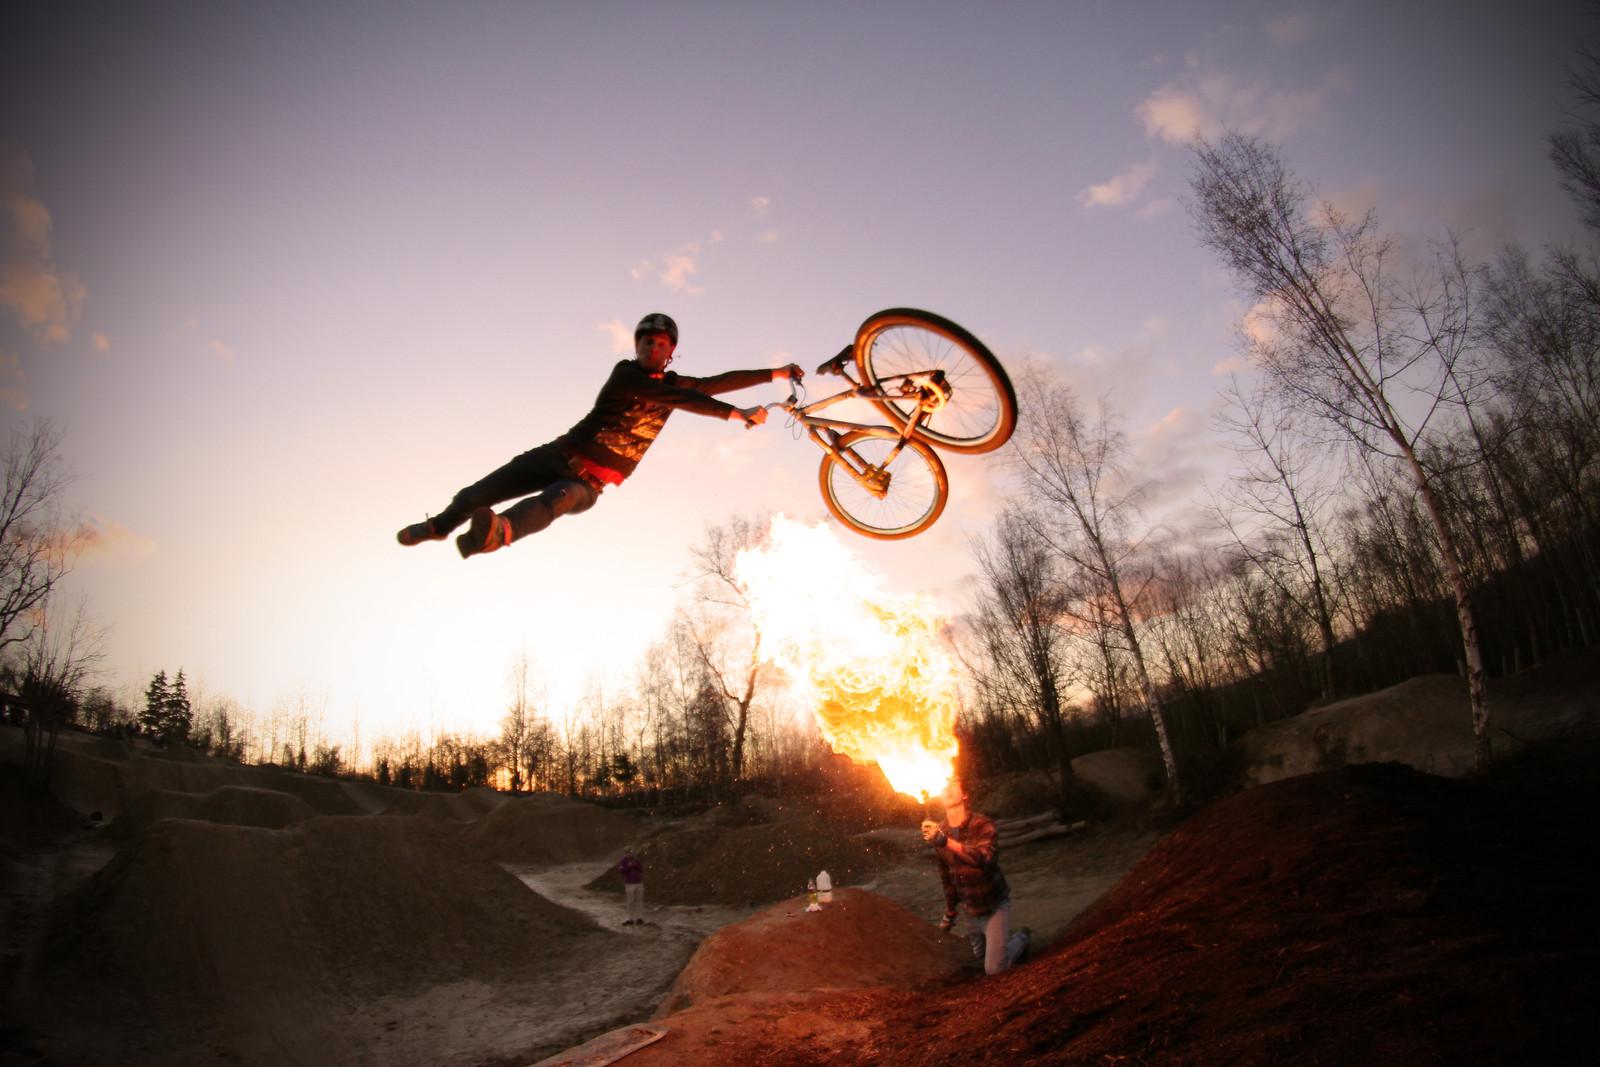 Fire and superish whip! - jamieledson - Mountain Biking Pictures - Vital MTB